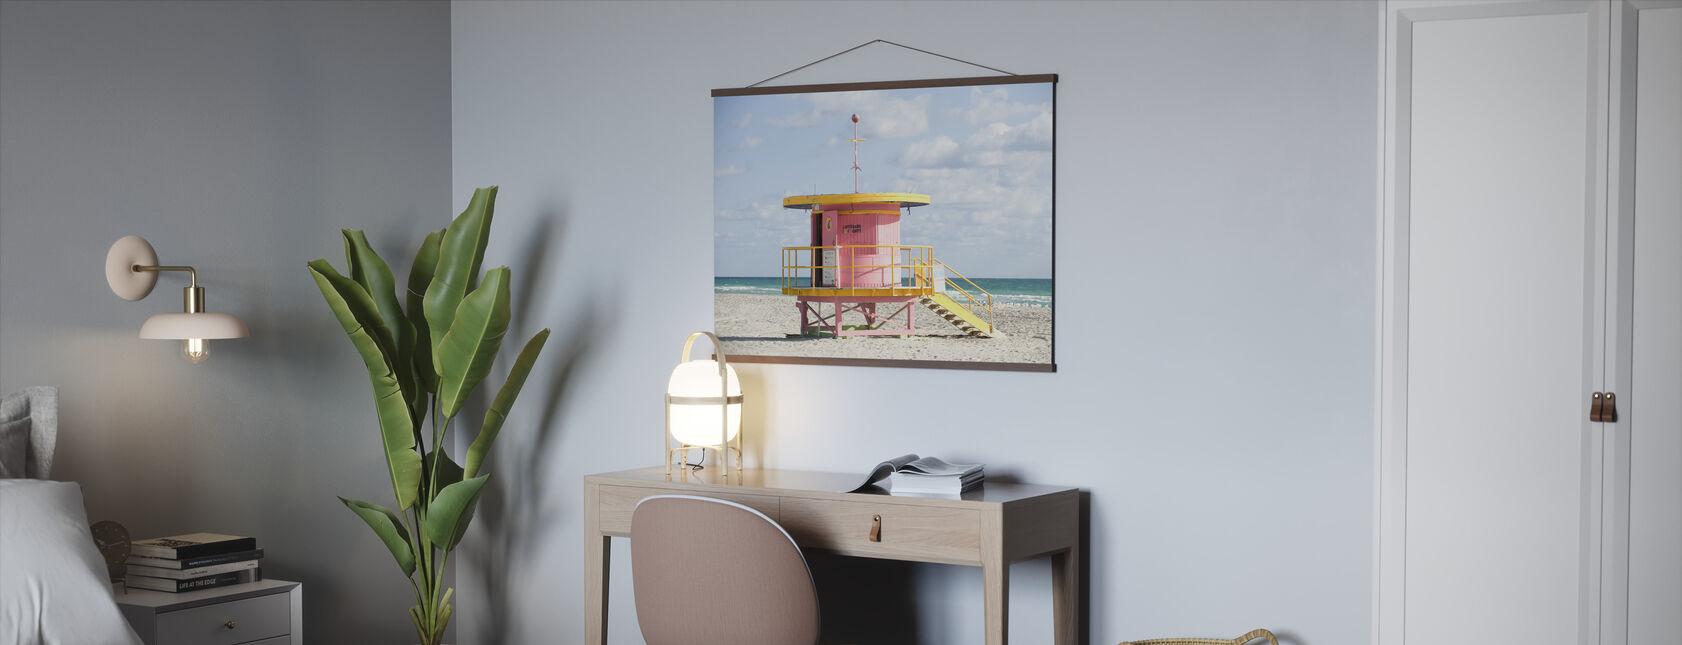 Tårnet i Miami, USA - Plakat - Kontor